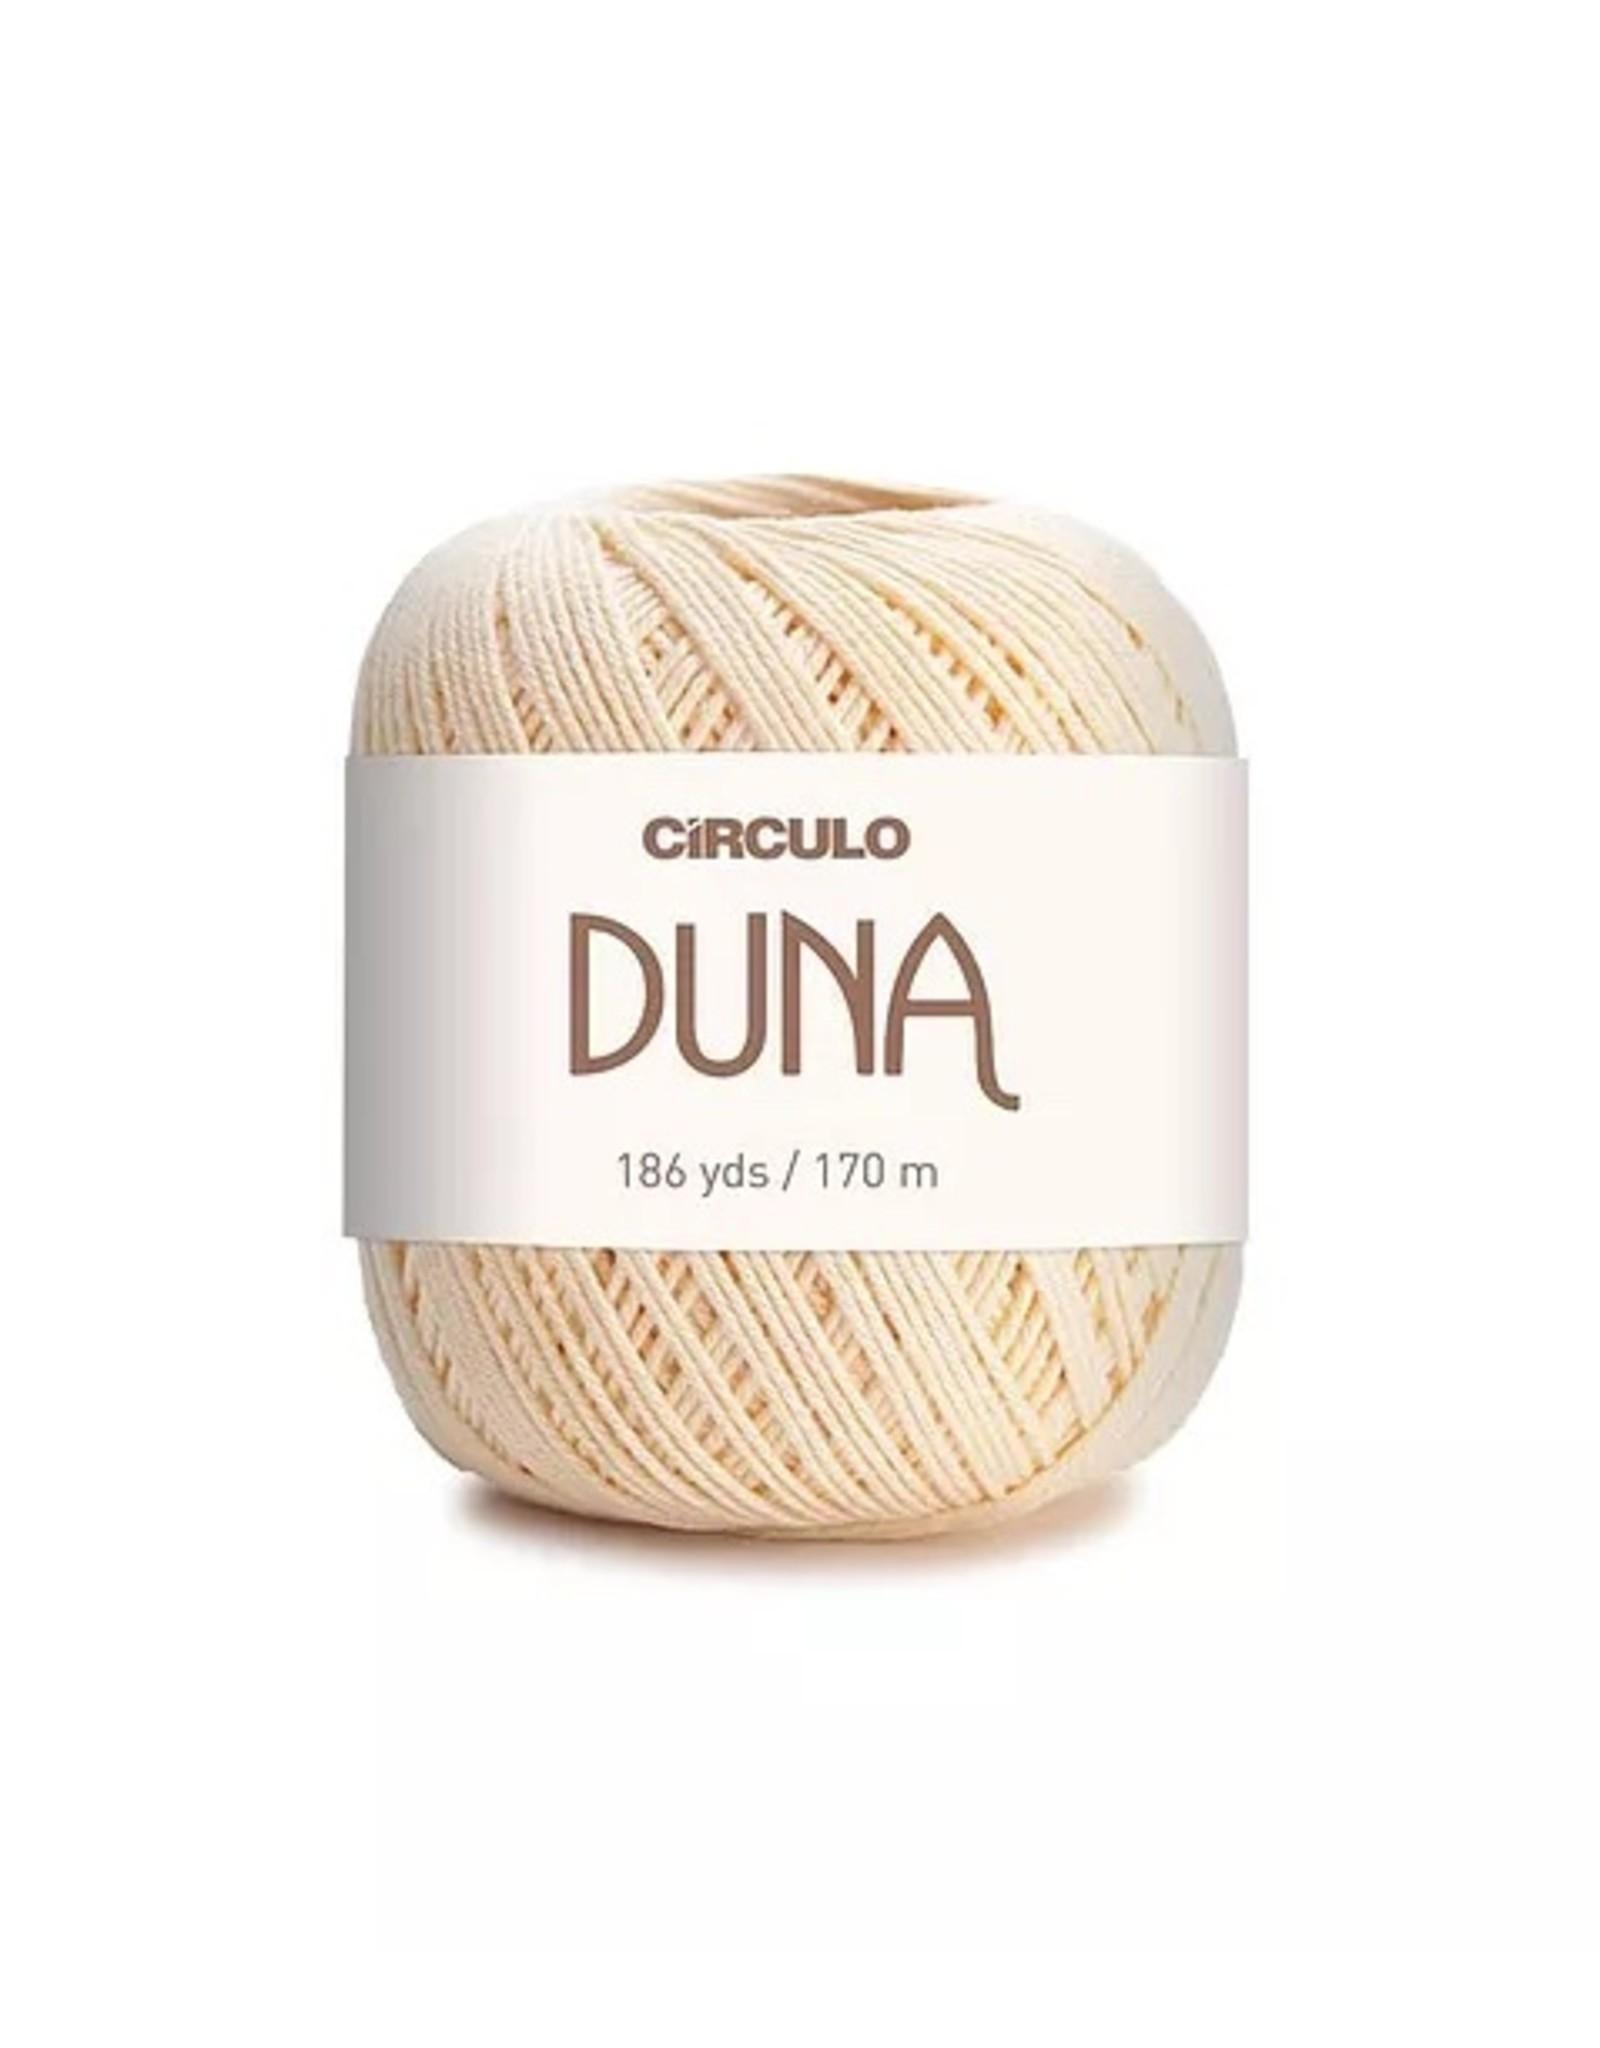 Circulo Duna